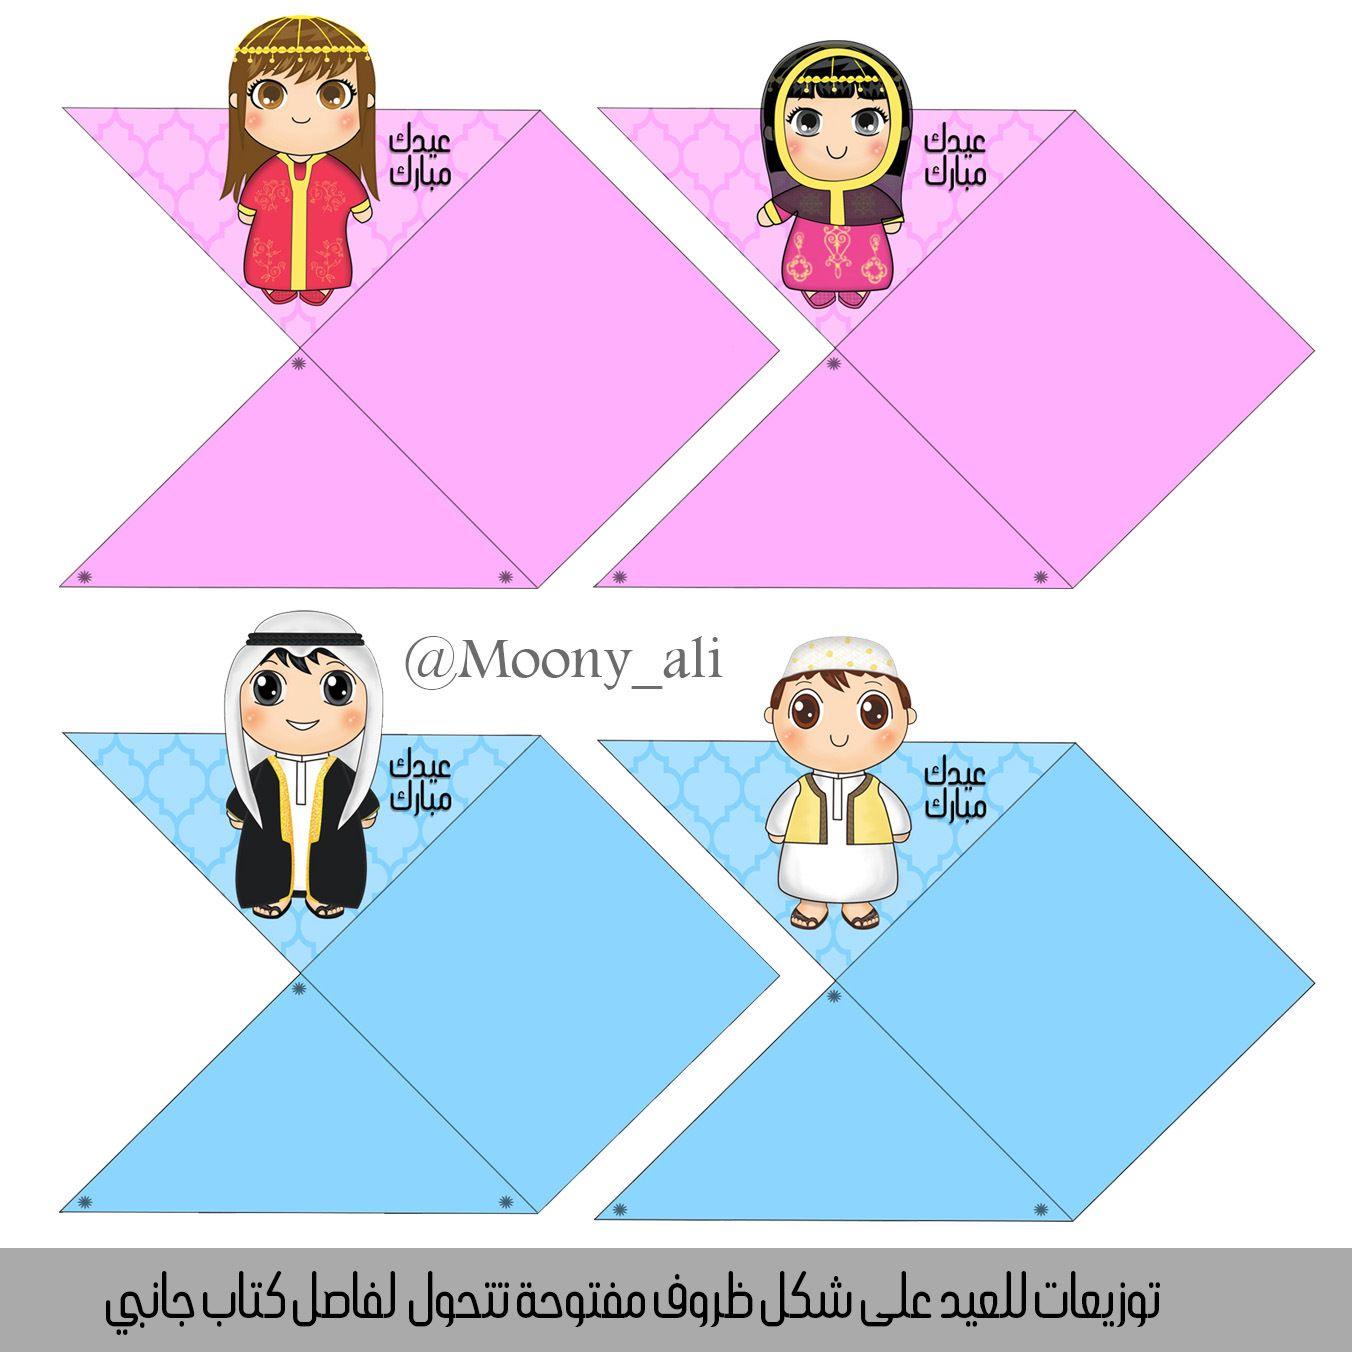 Pin By Fatima On تصاميم لكل المناسبات Eid Stickers Eid Crafts Eid Cards